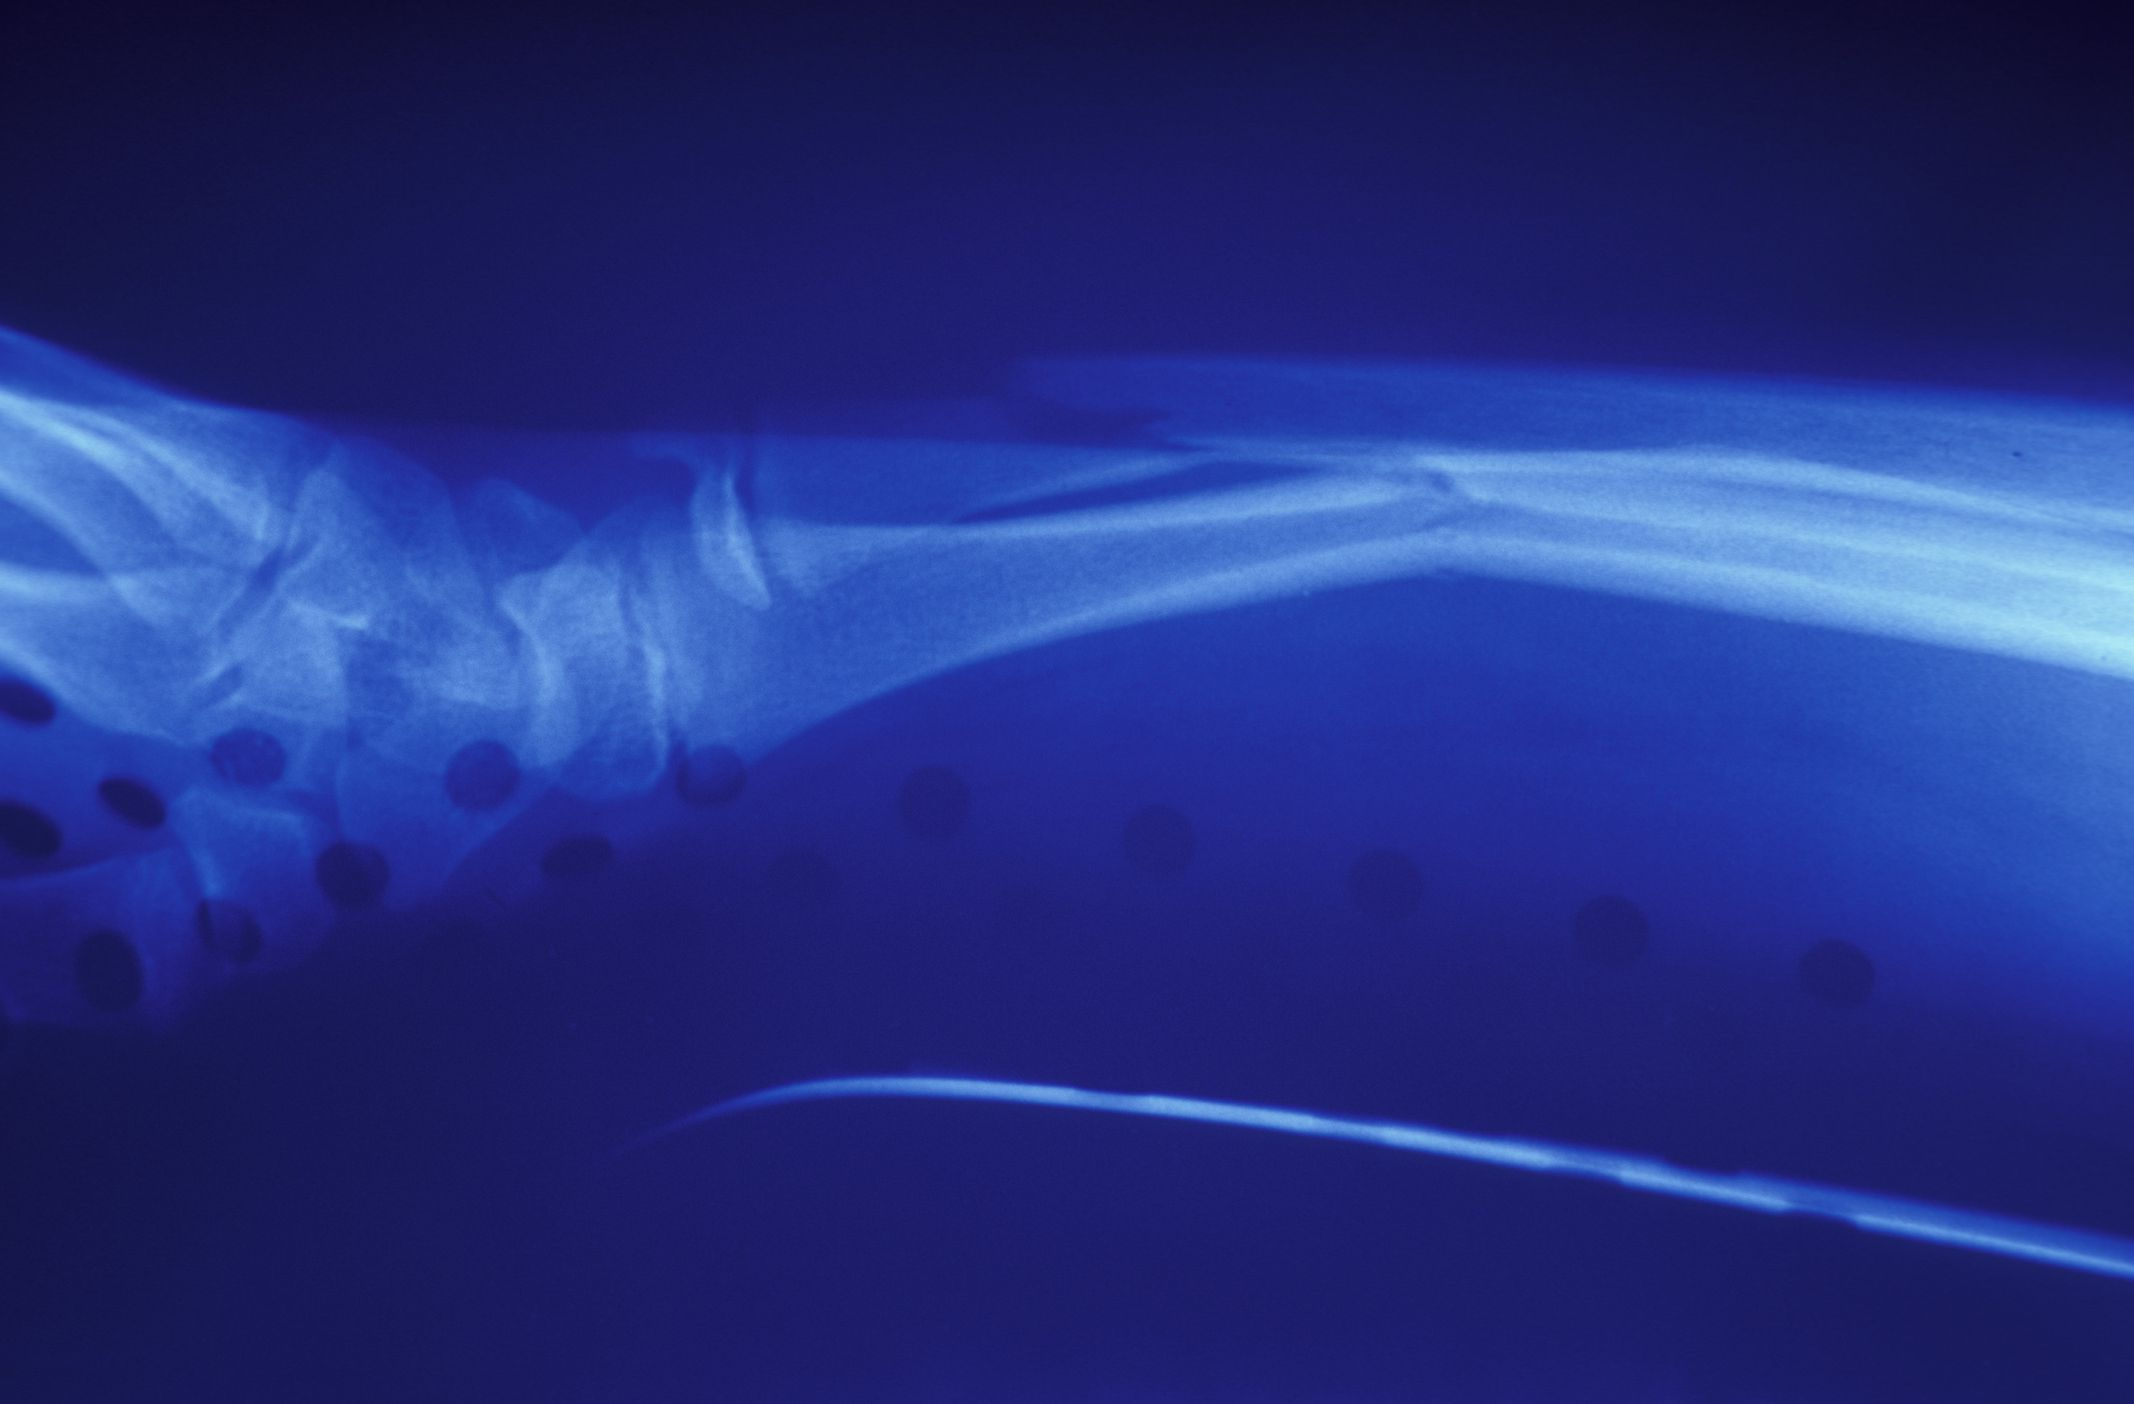 X-ray of a broken wrist